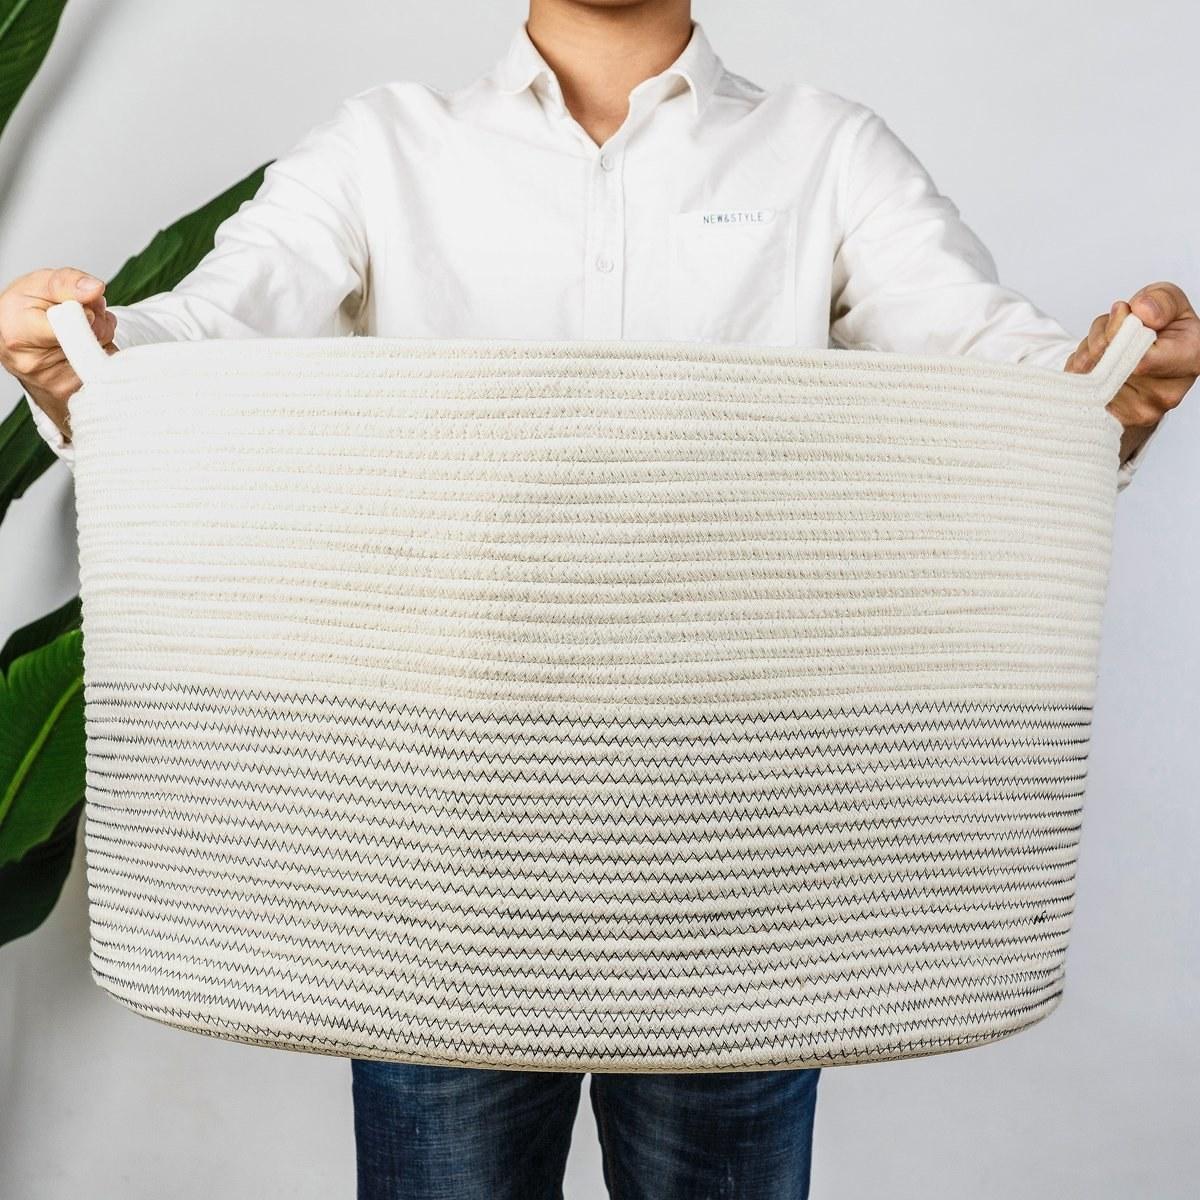 person holding large rope storage basket